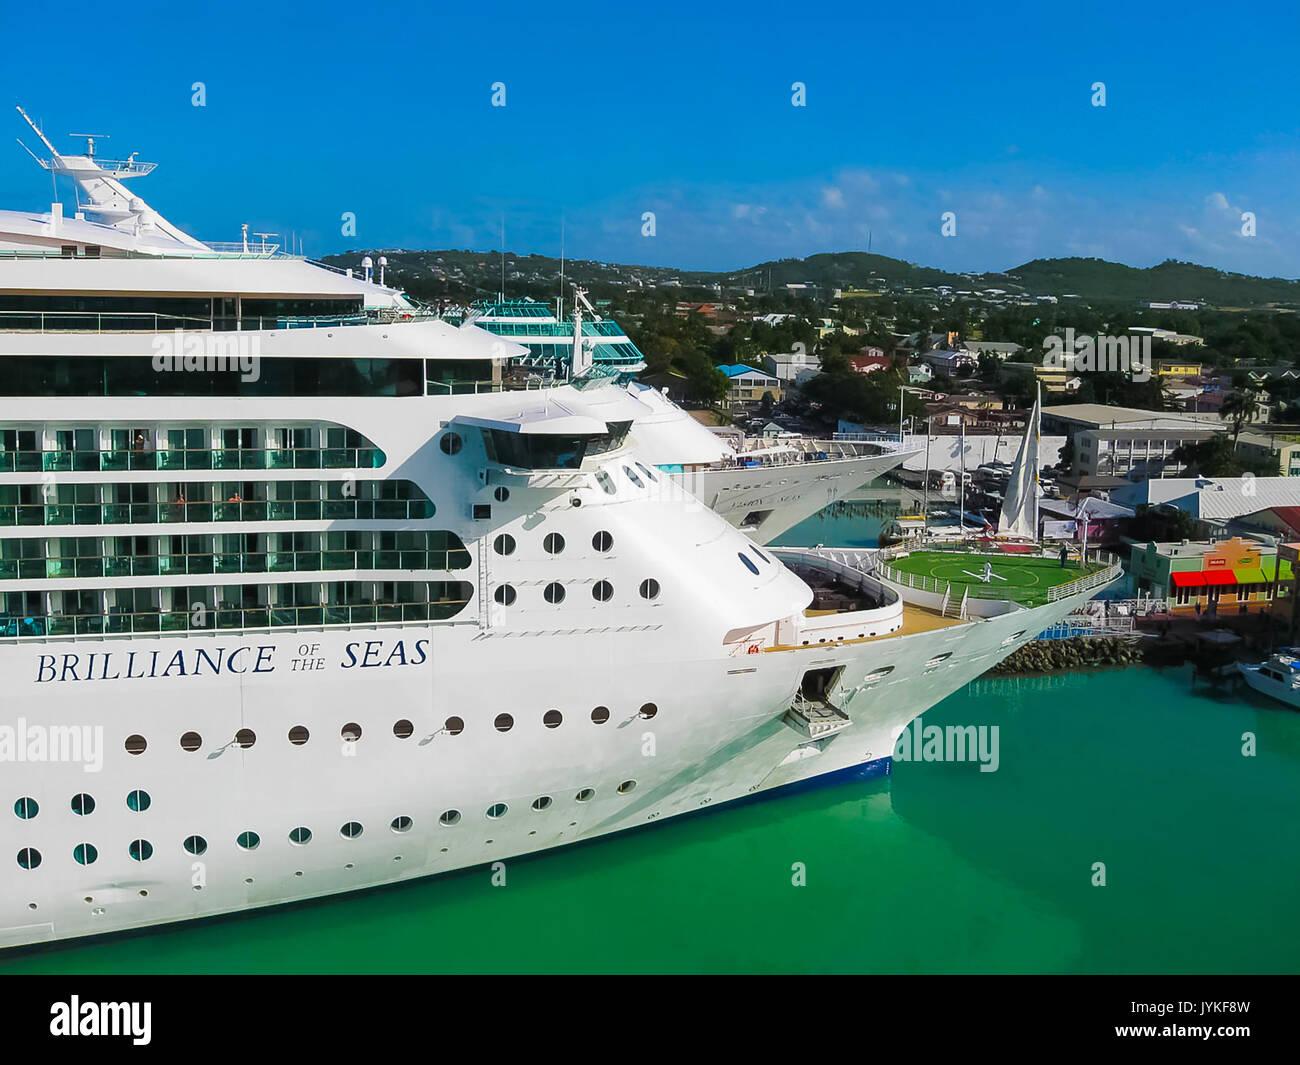 St. John's, Antigua and Barbuda - February 07, 2013: Cruise ship Brilliance of the Seas Royal Caribbean International Stock Photo